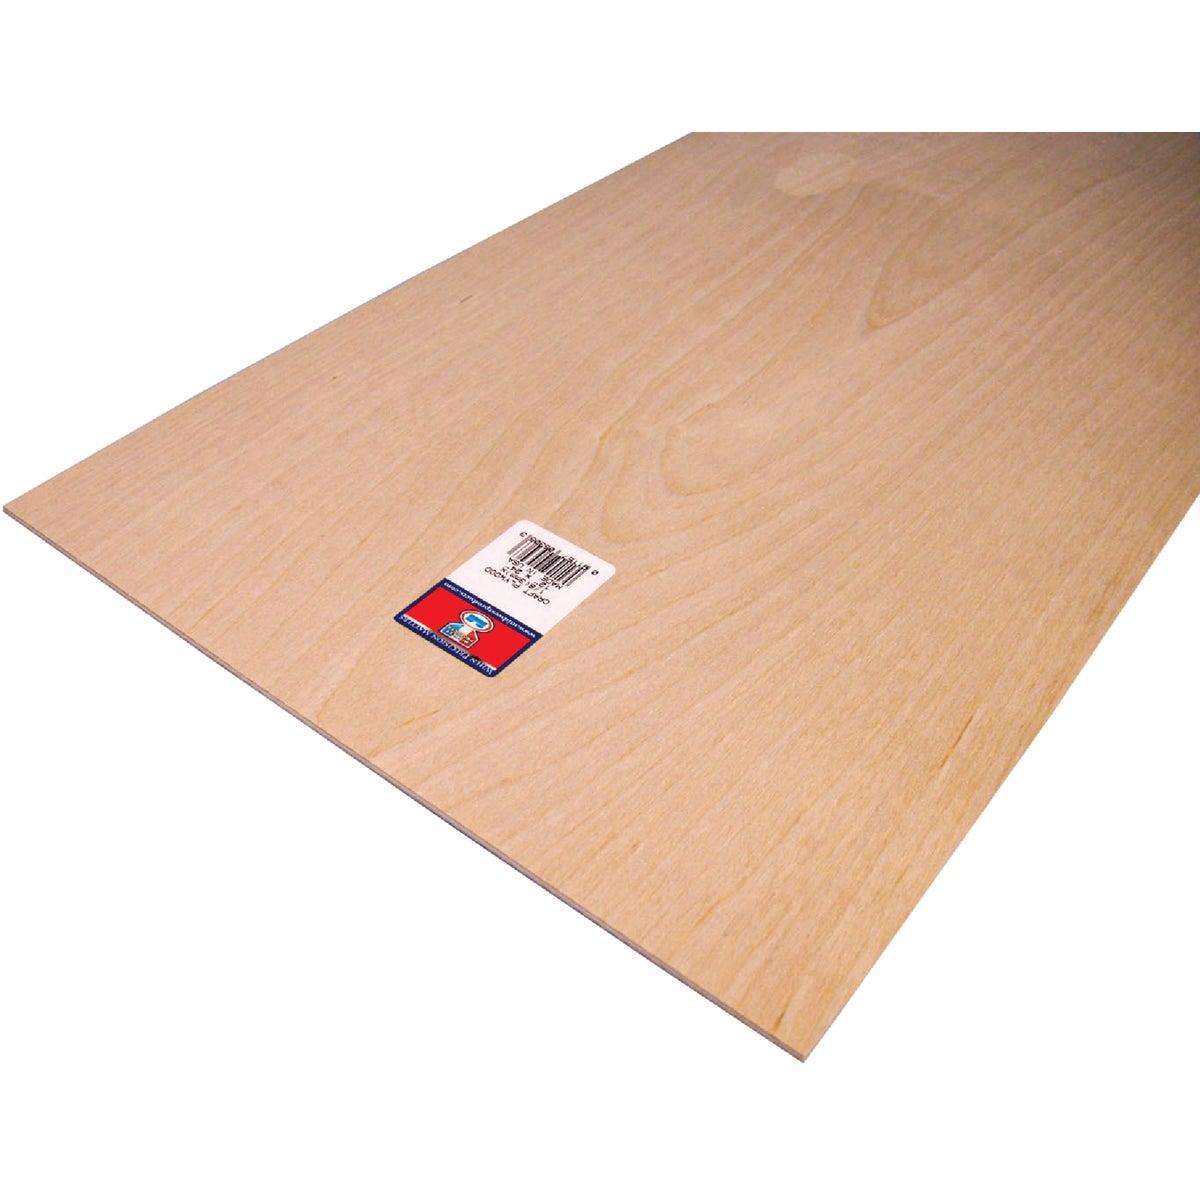 1/8X12X24 Plywood